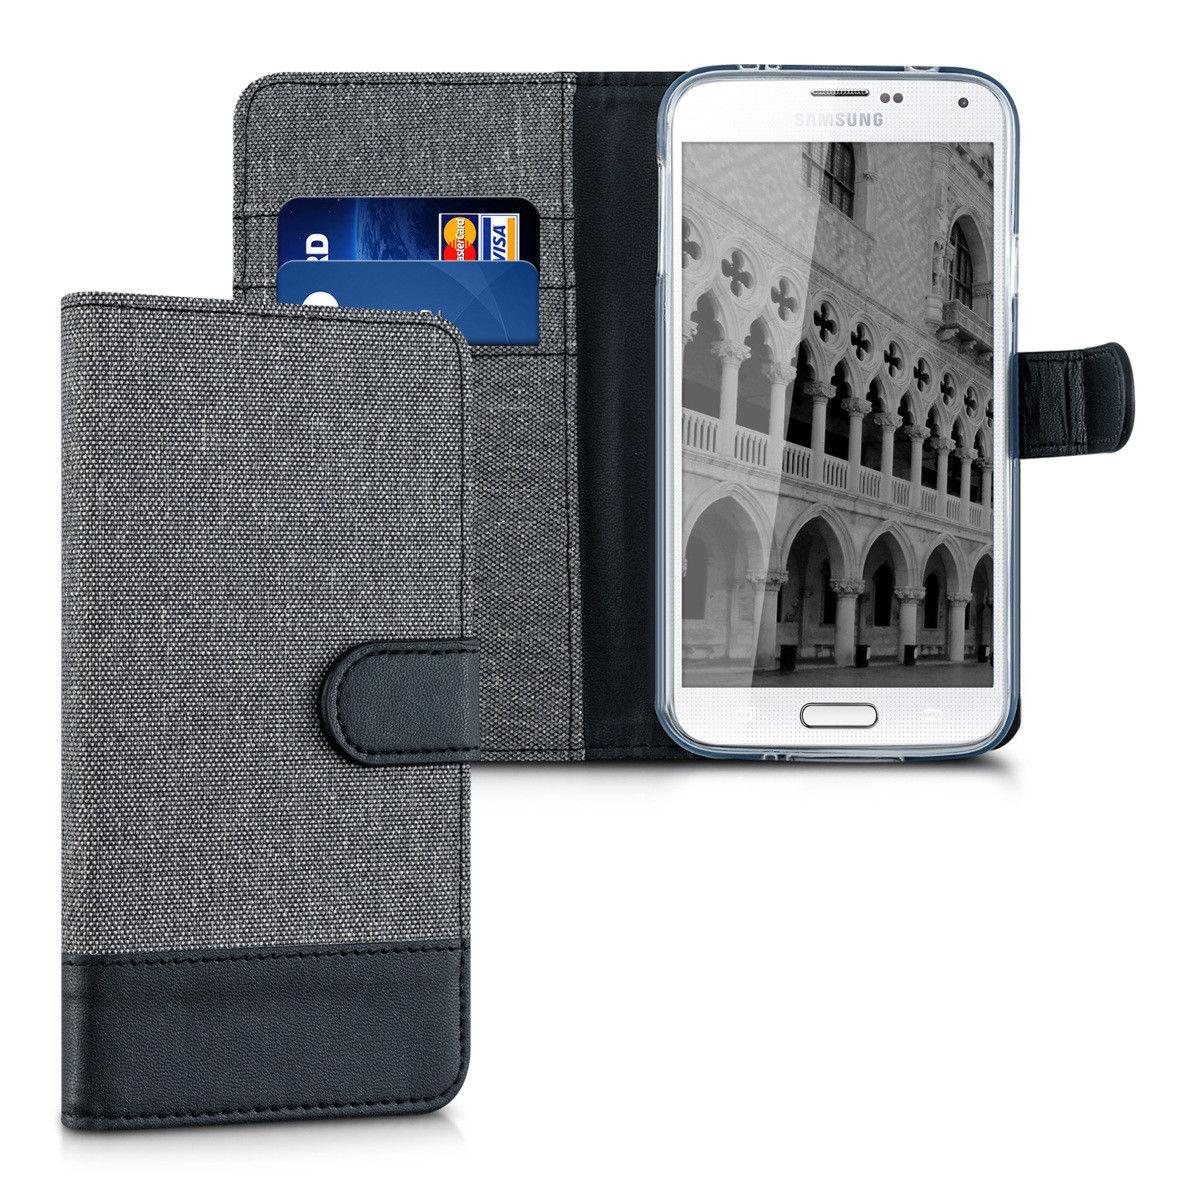 Pouzdro pro Samsung Galaxy S5 šedé